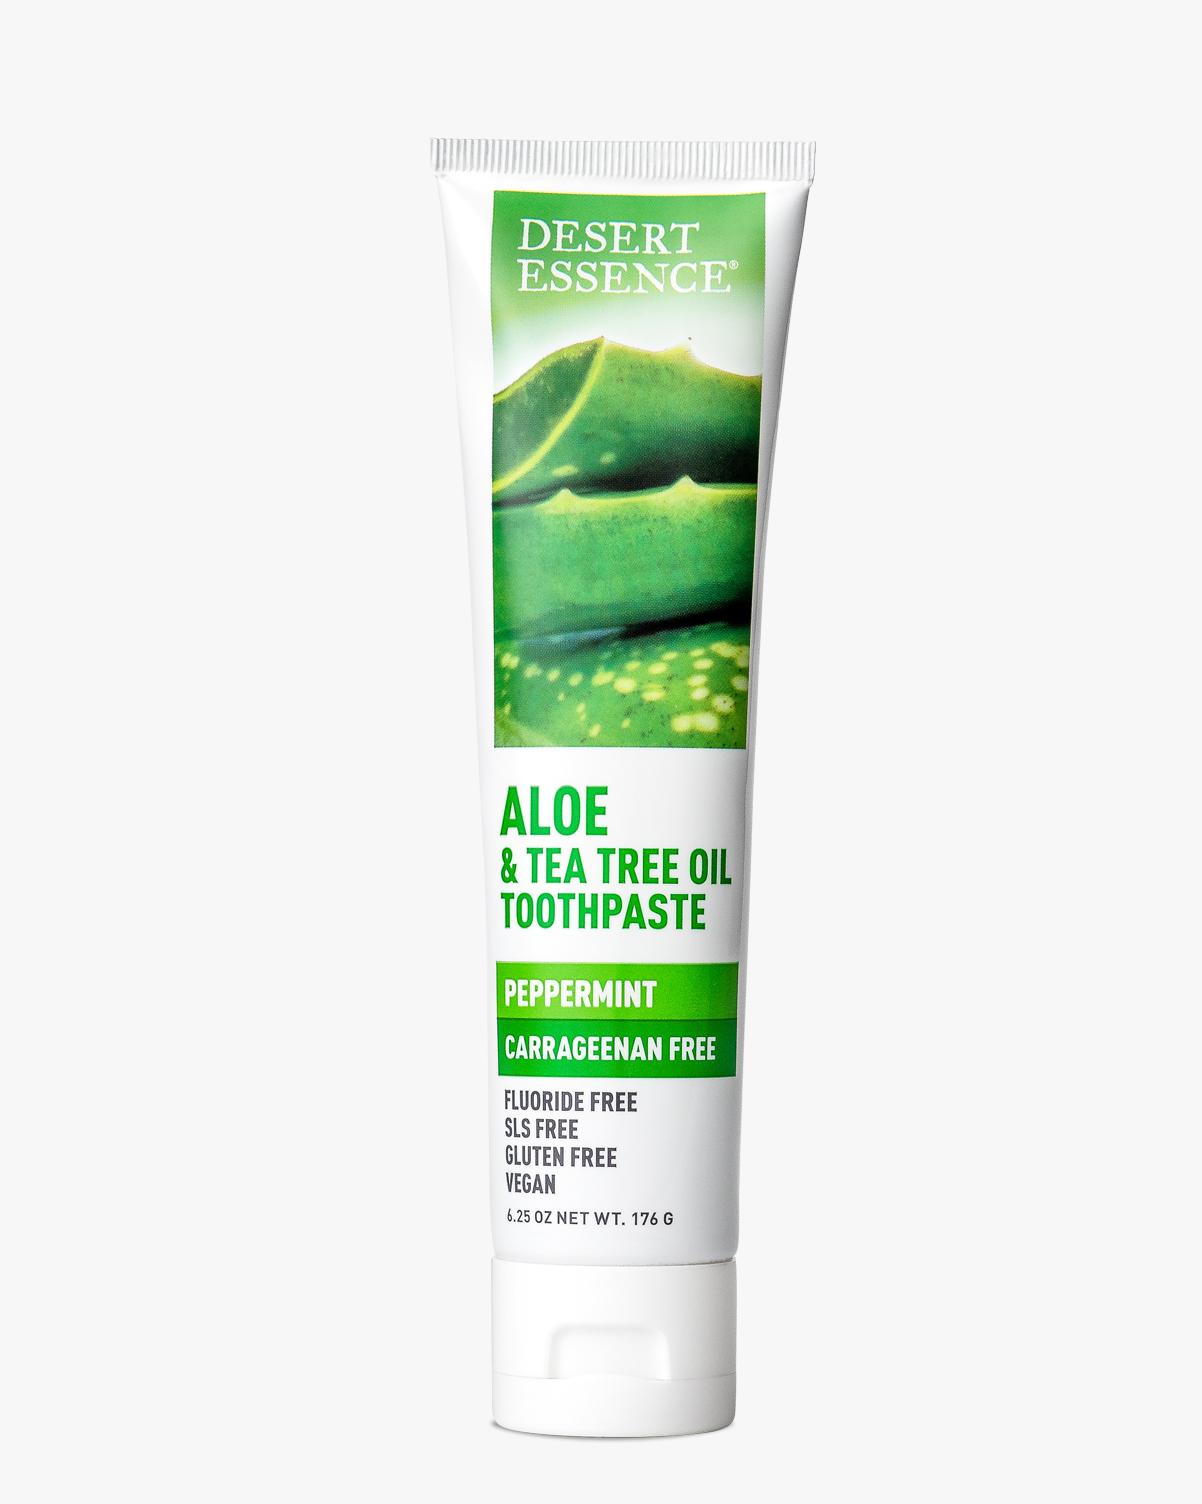 Desert Essence coupon: Desert Essence Aloe & Tea Tree Oil Carrageenan Free Toothpaste, 6.25 oz. | Vegan | Gluten-Free